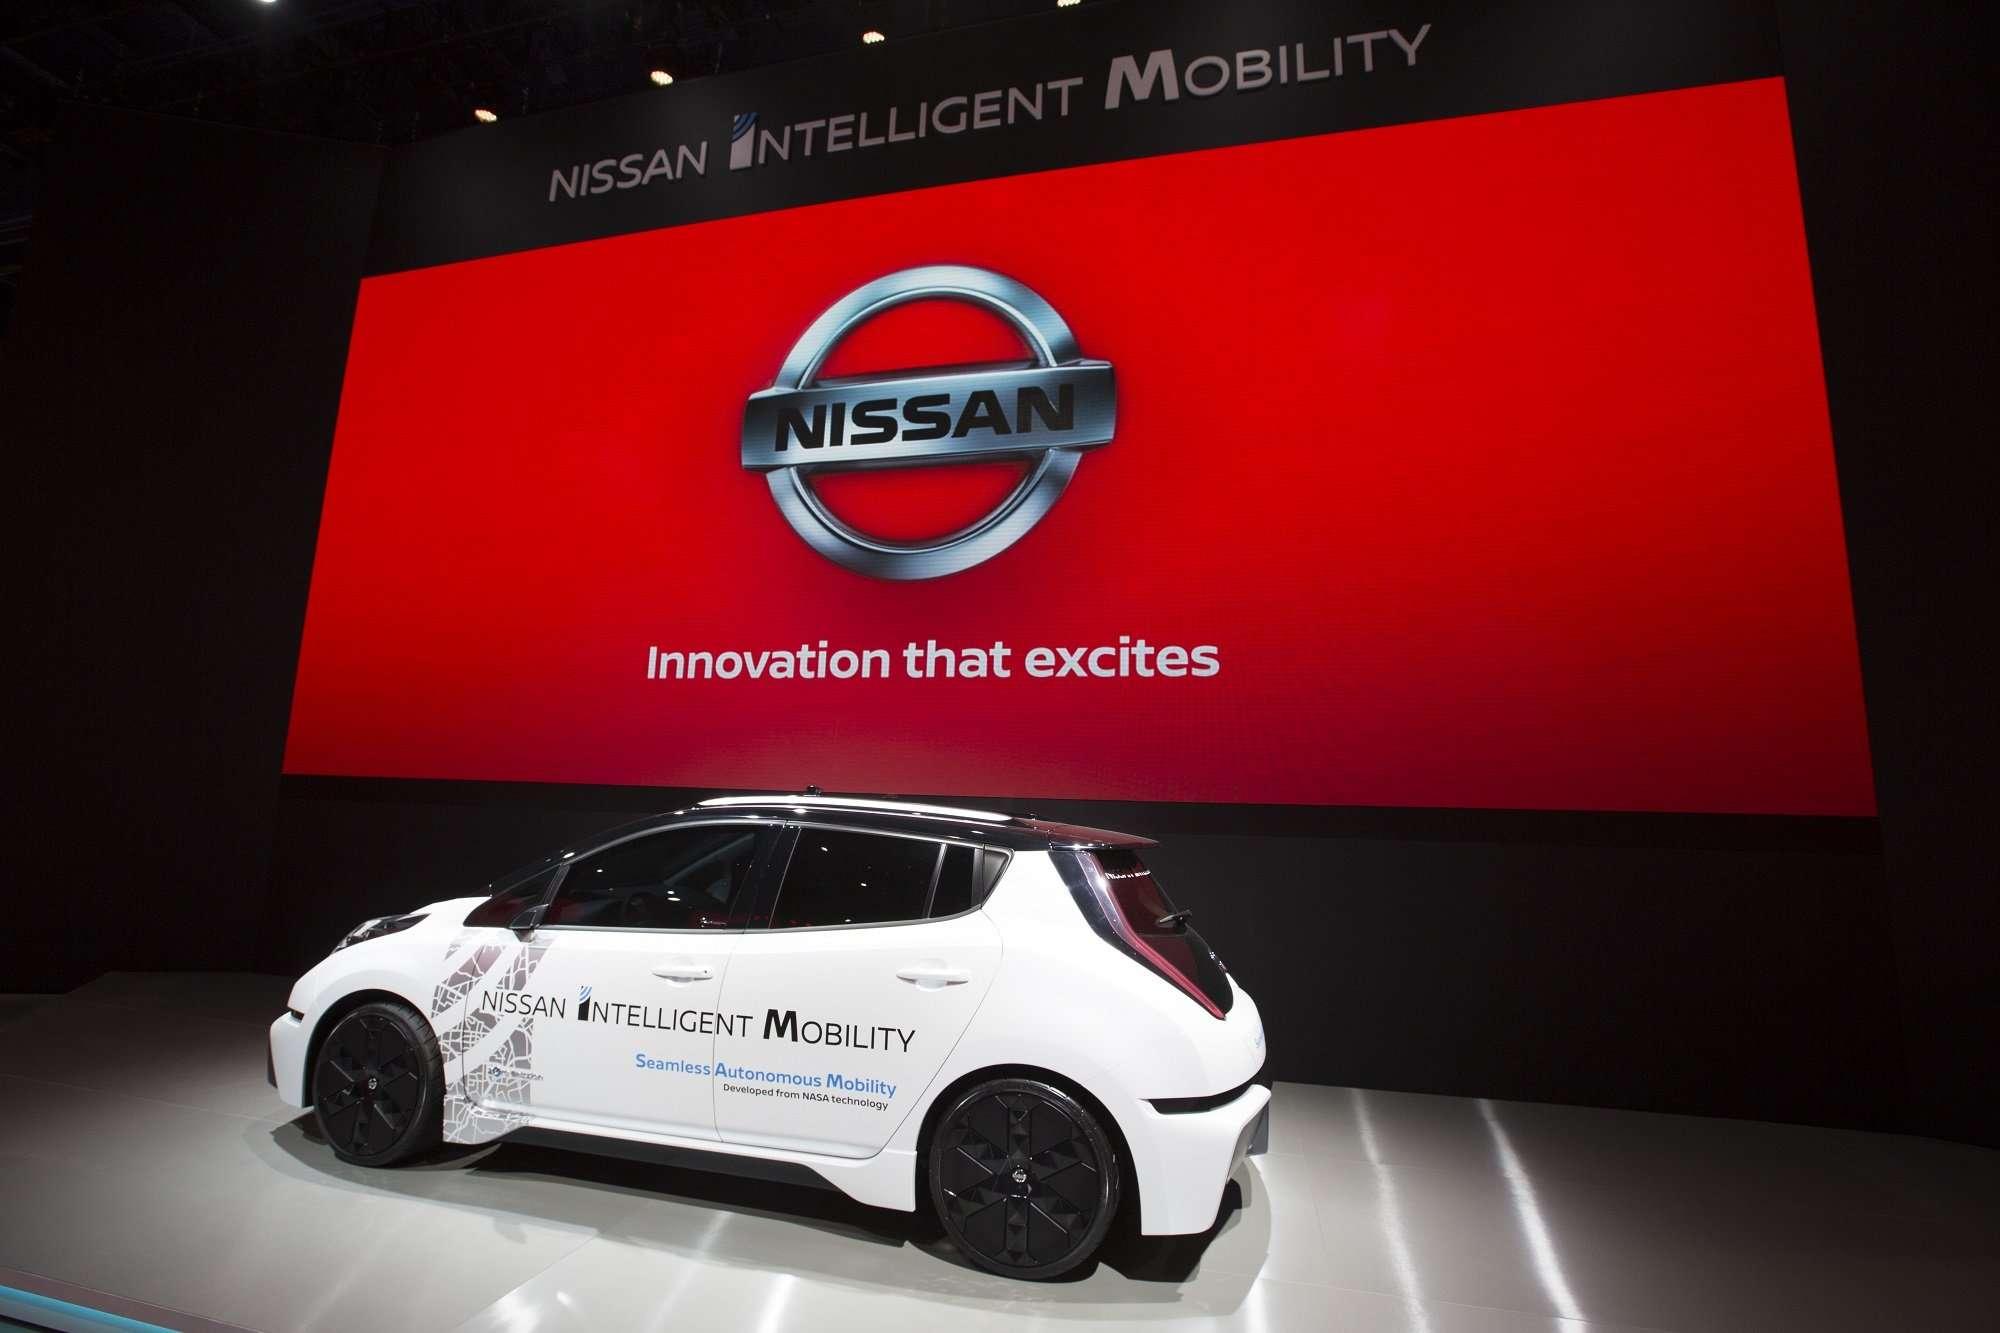 Nissan Hadirkan Terobosan Zero-Emission dan Zero-Fatality